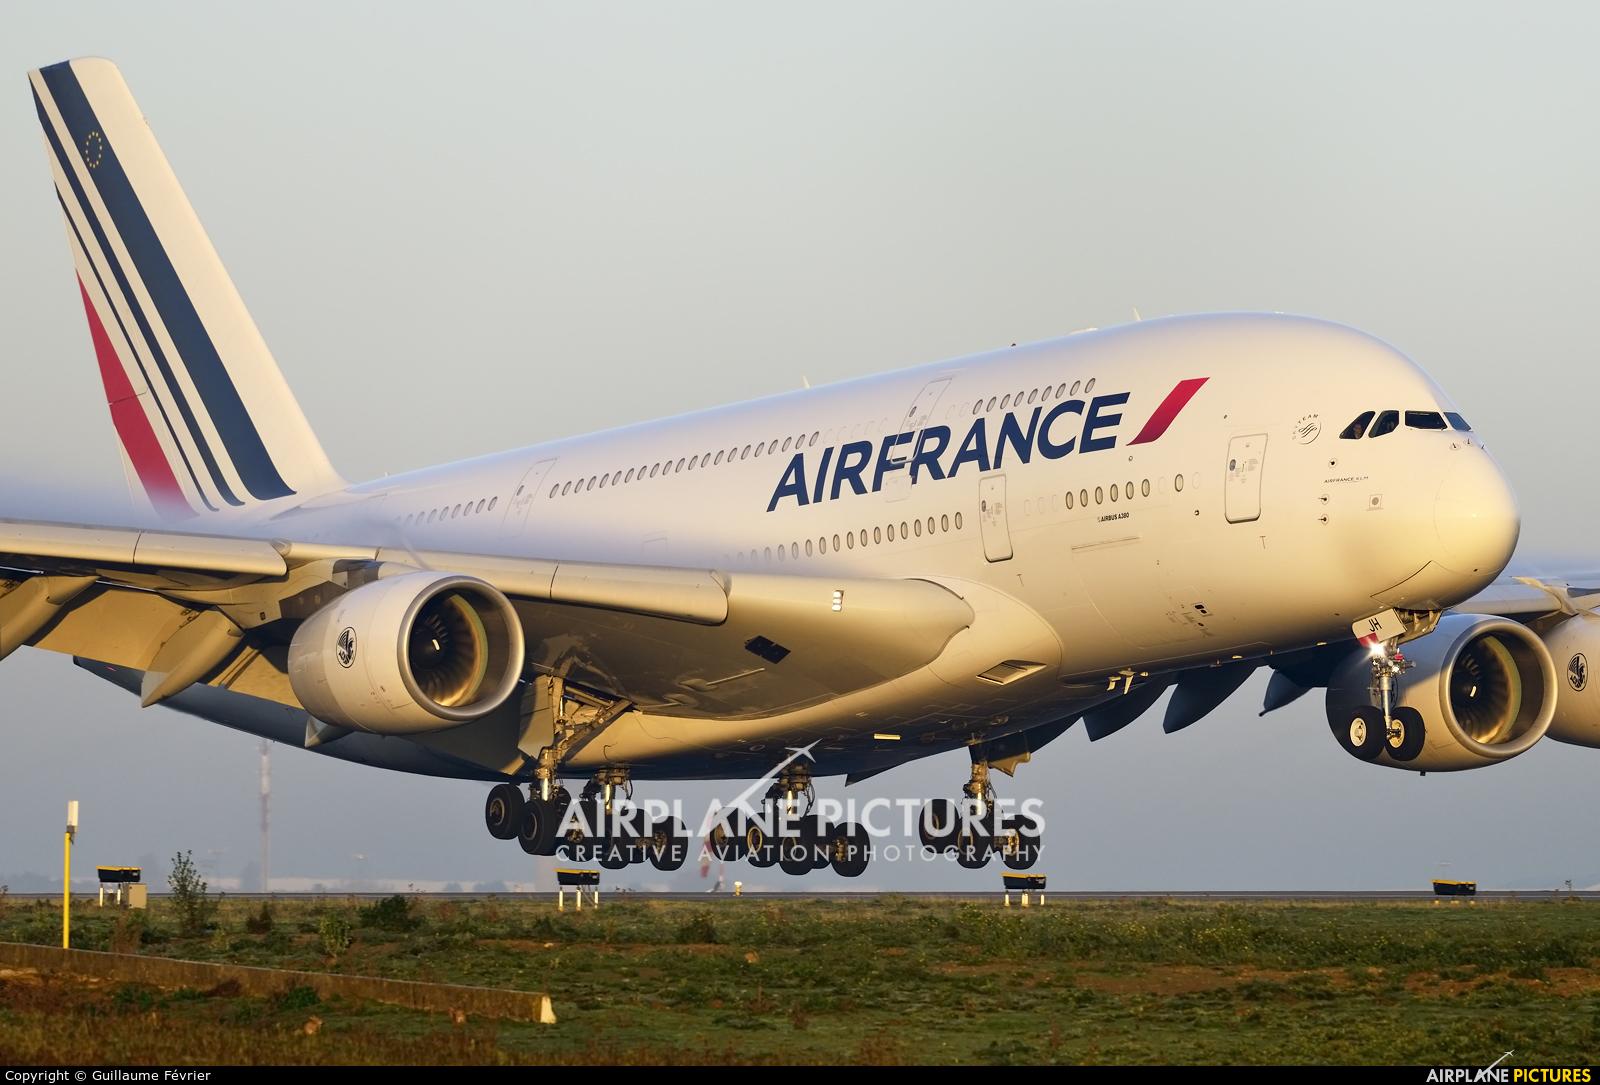 Air France F-HPJH aircraft at Paris - Charles de Gaulle